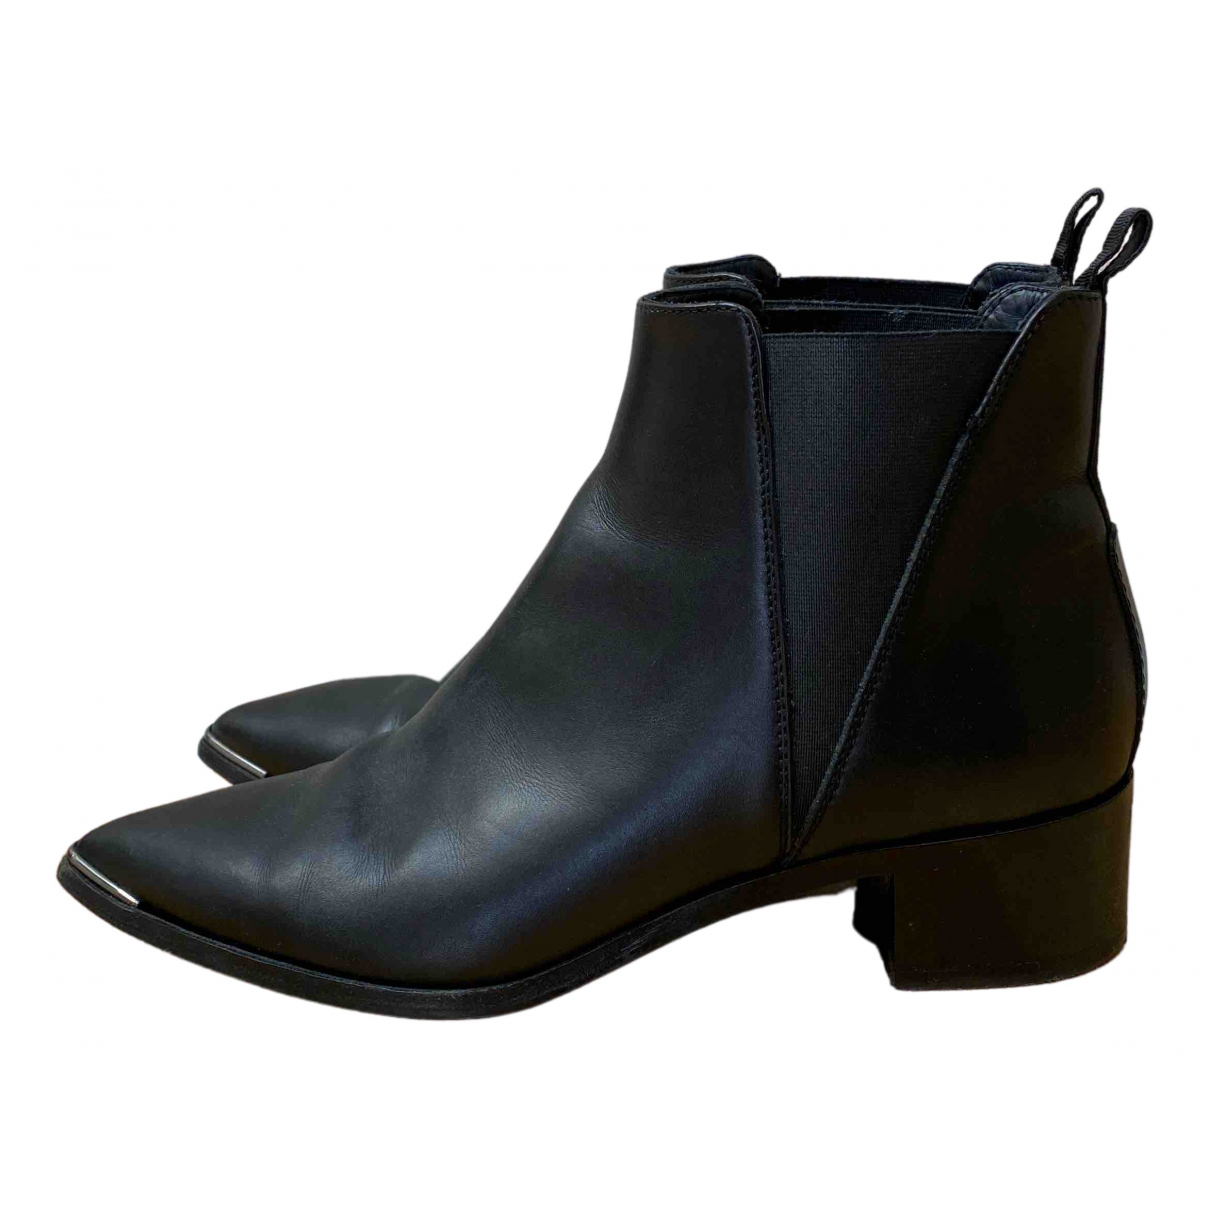 Acne Studios Jensen / Jenny Black Leather Ankle boots for Women 39 EU